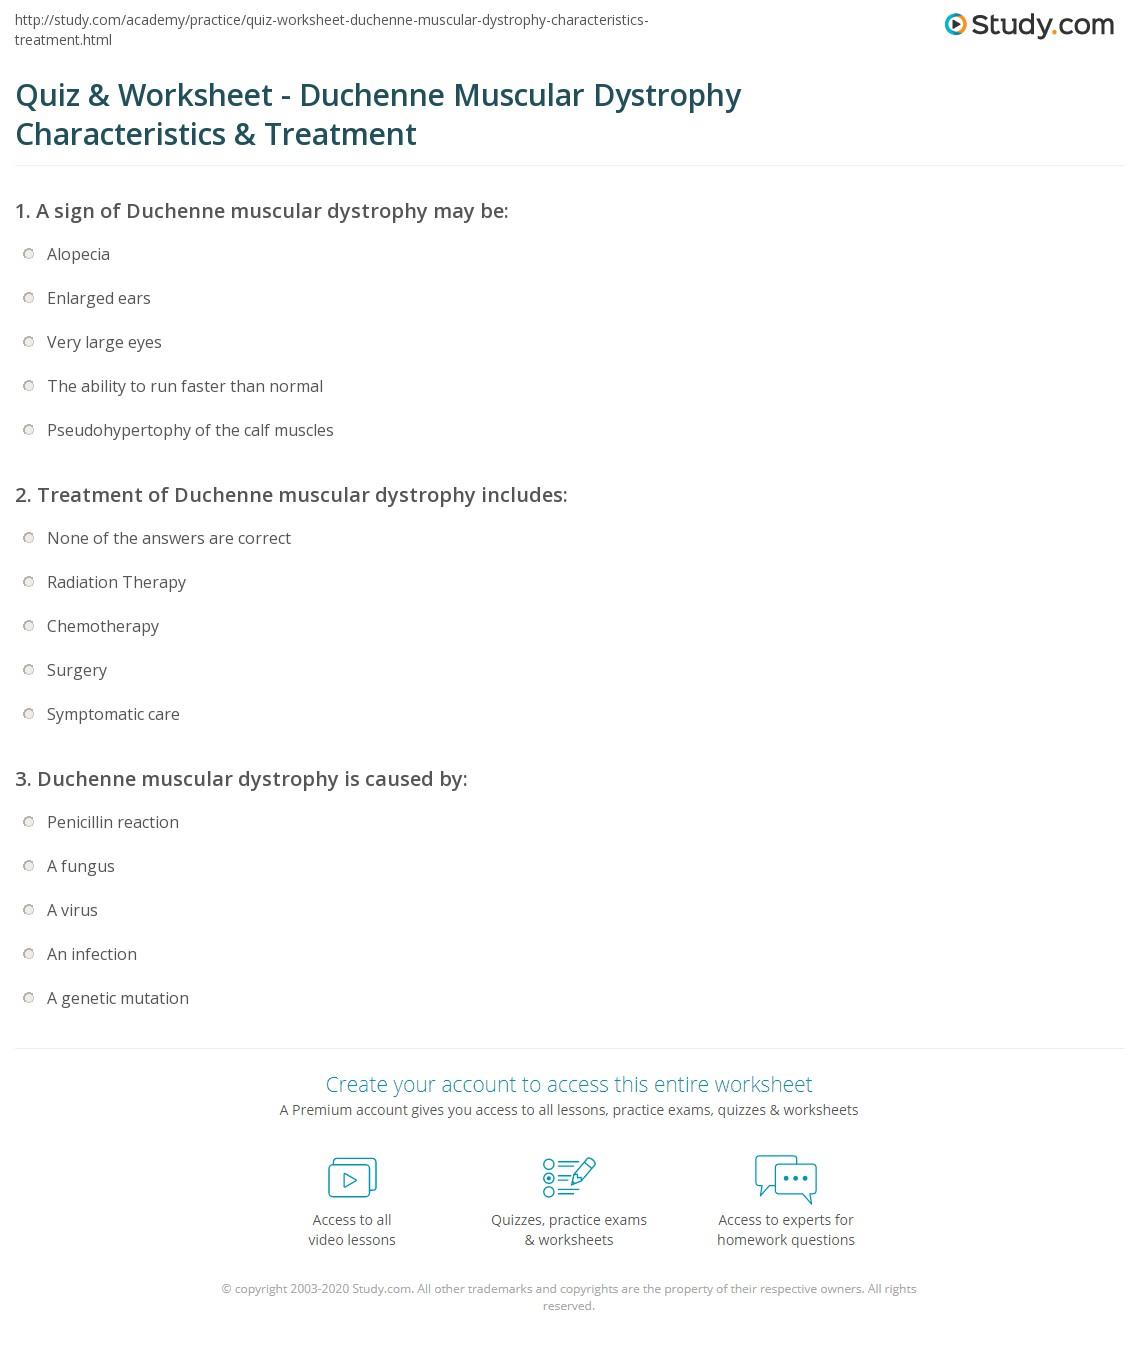 quiz & worksheet - duchenne muscular dystrophy characteristics